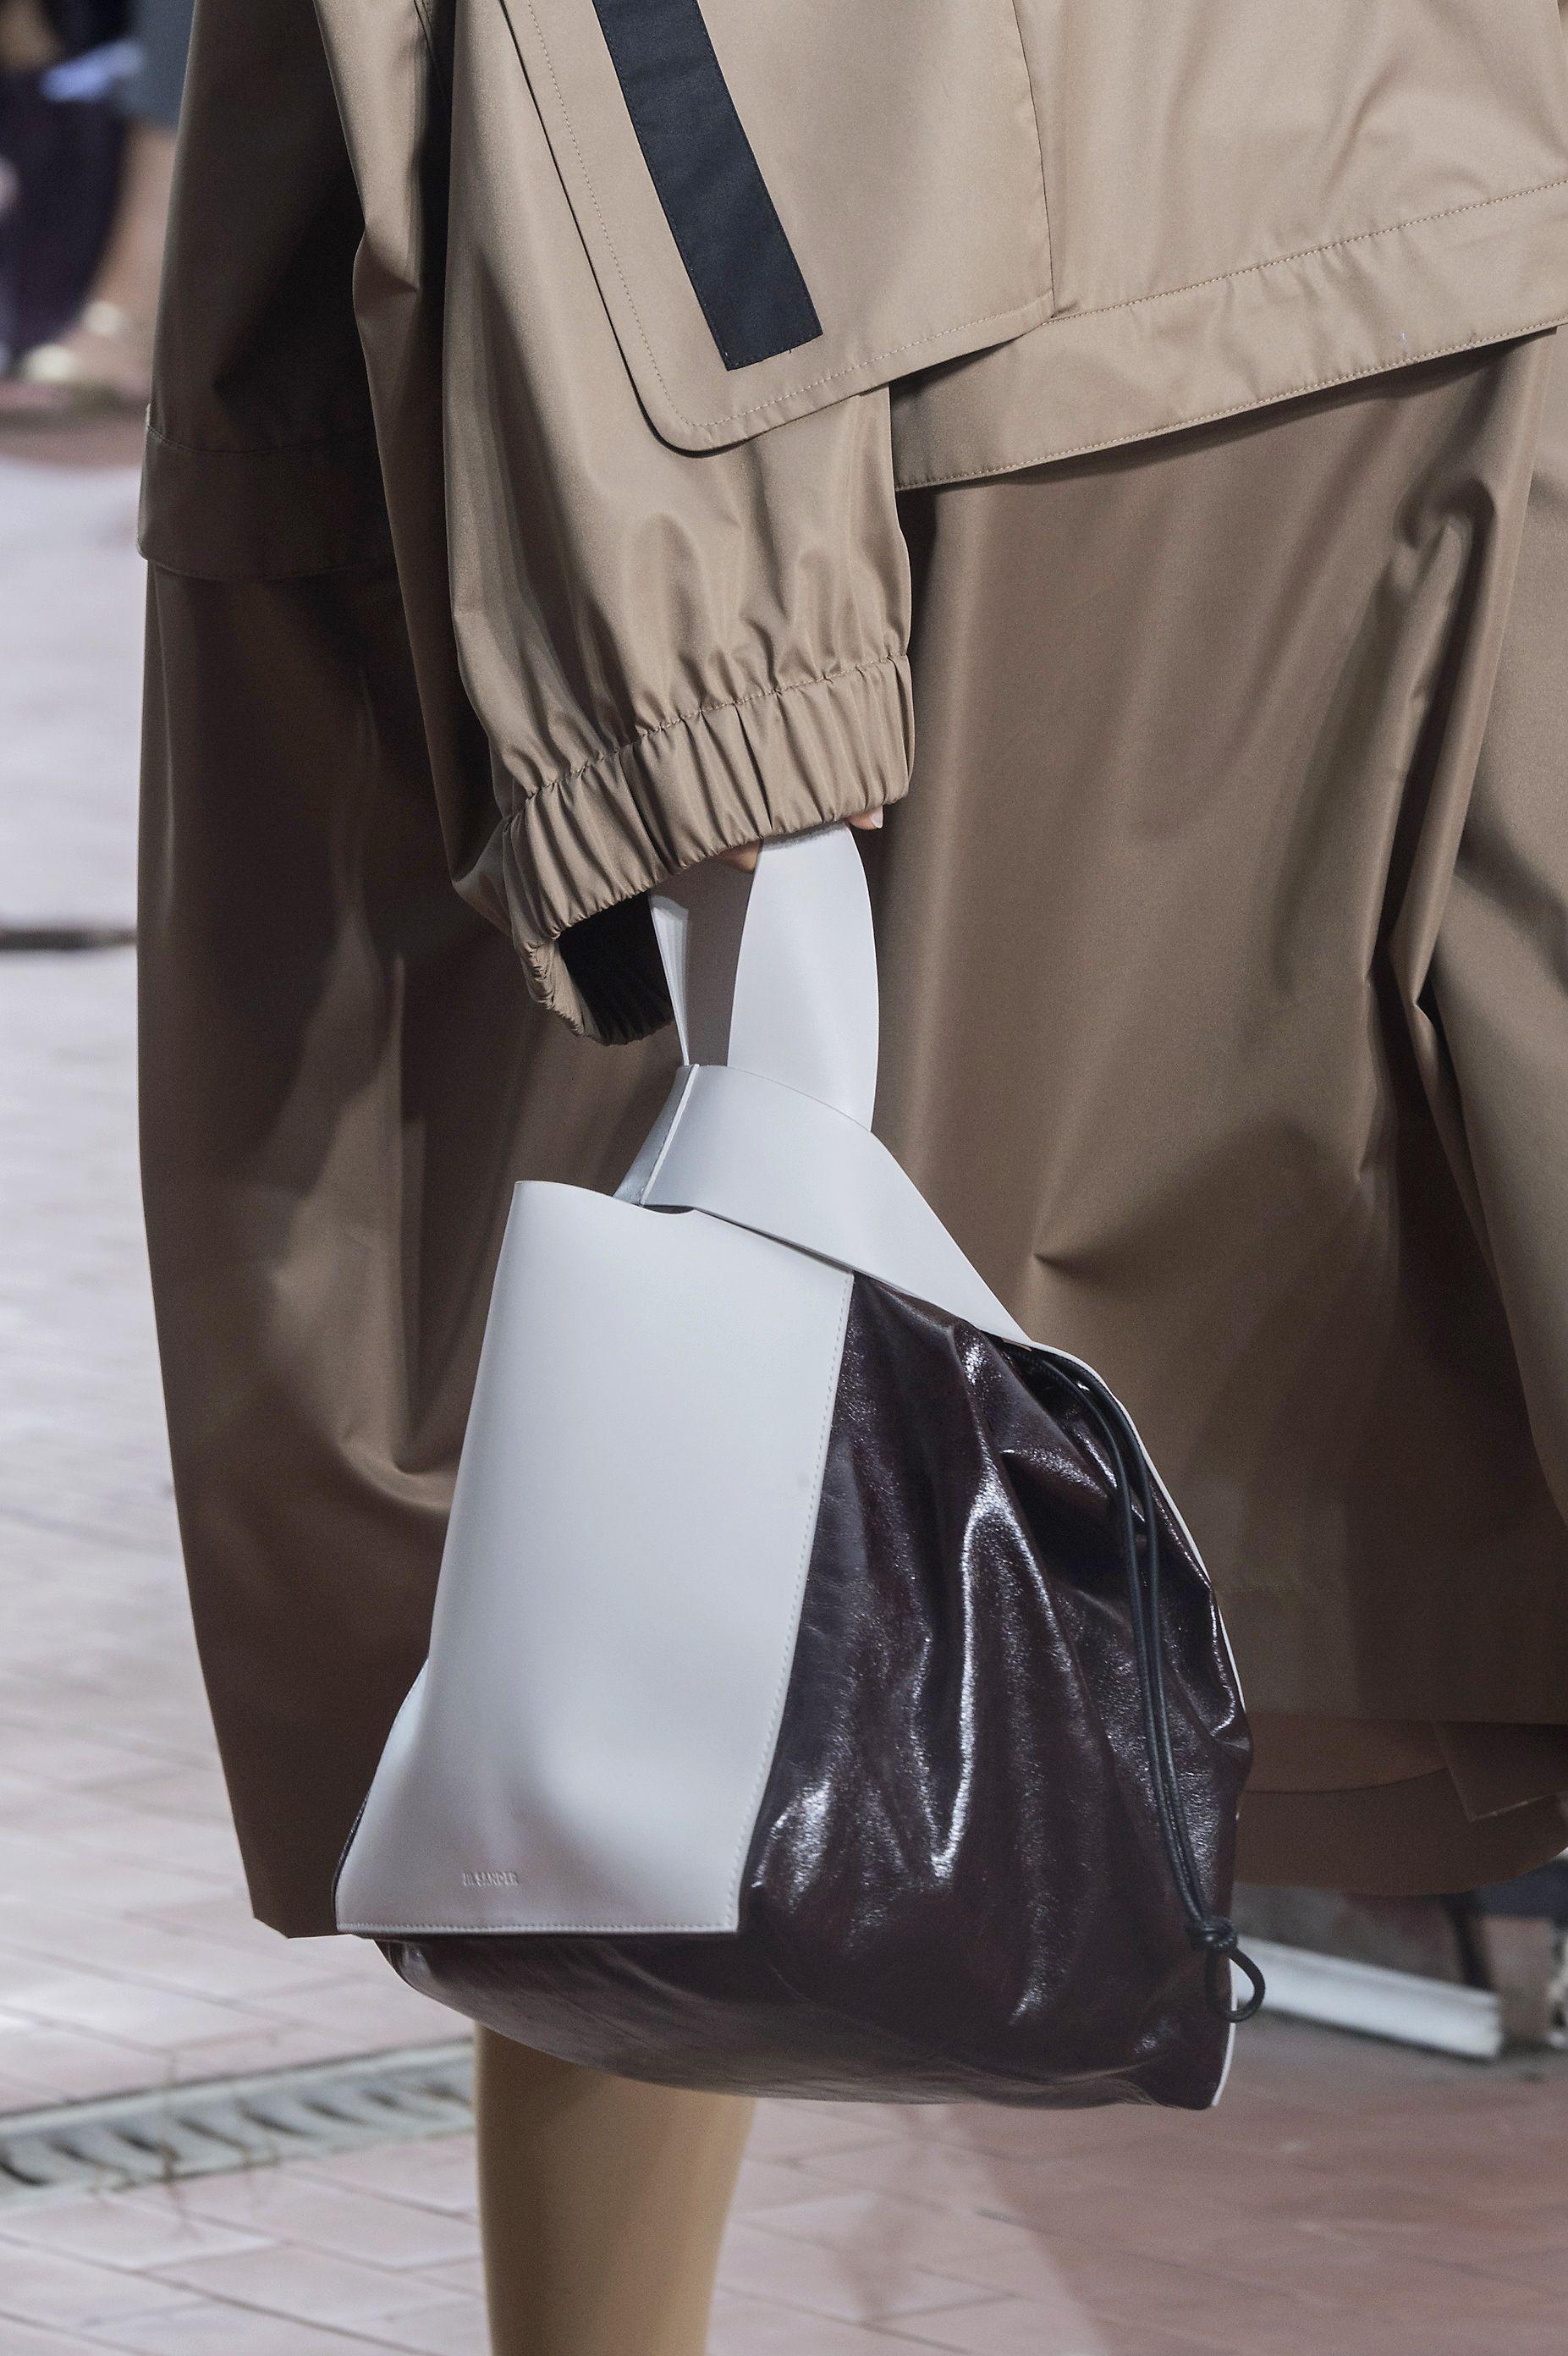 Best Spring 2019 Bags On The Runway - Spring 2019 Bag Trends 3803232751